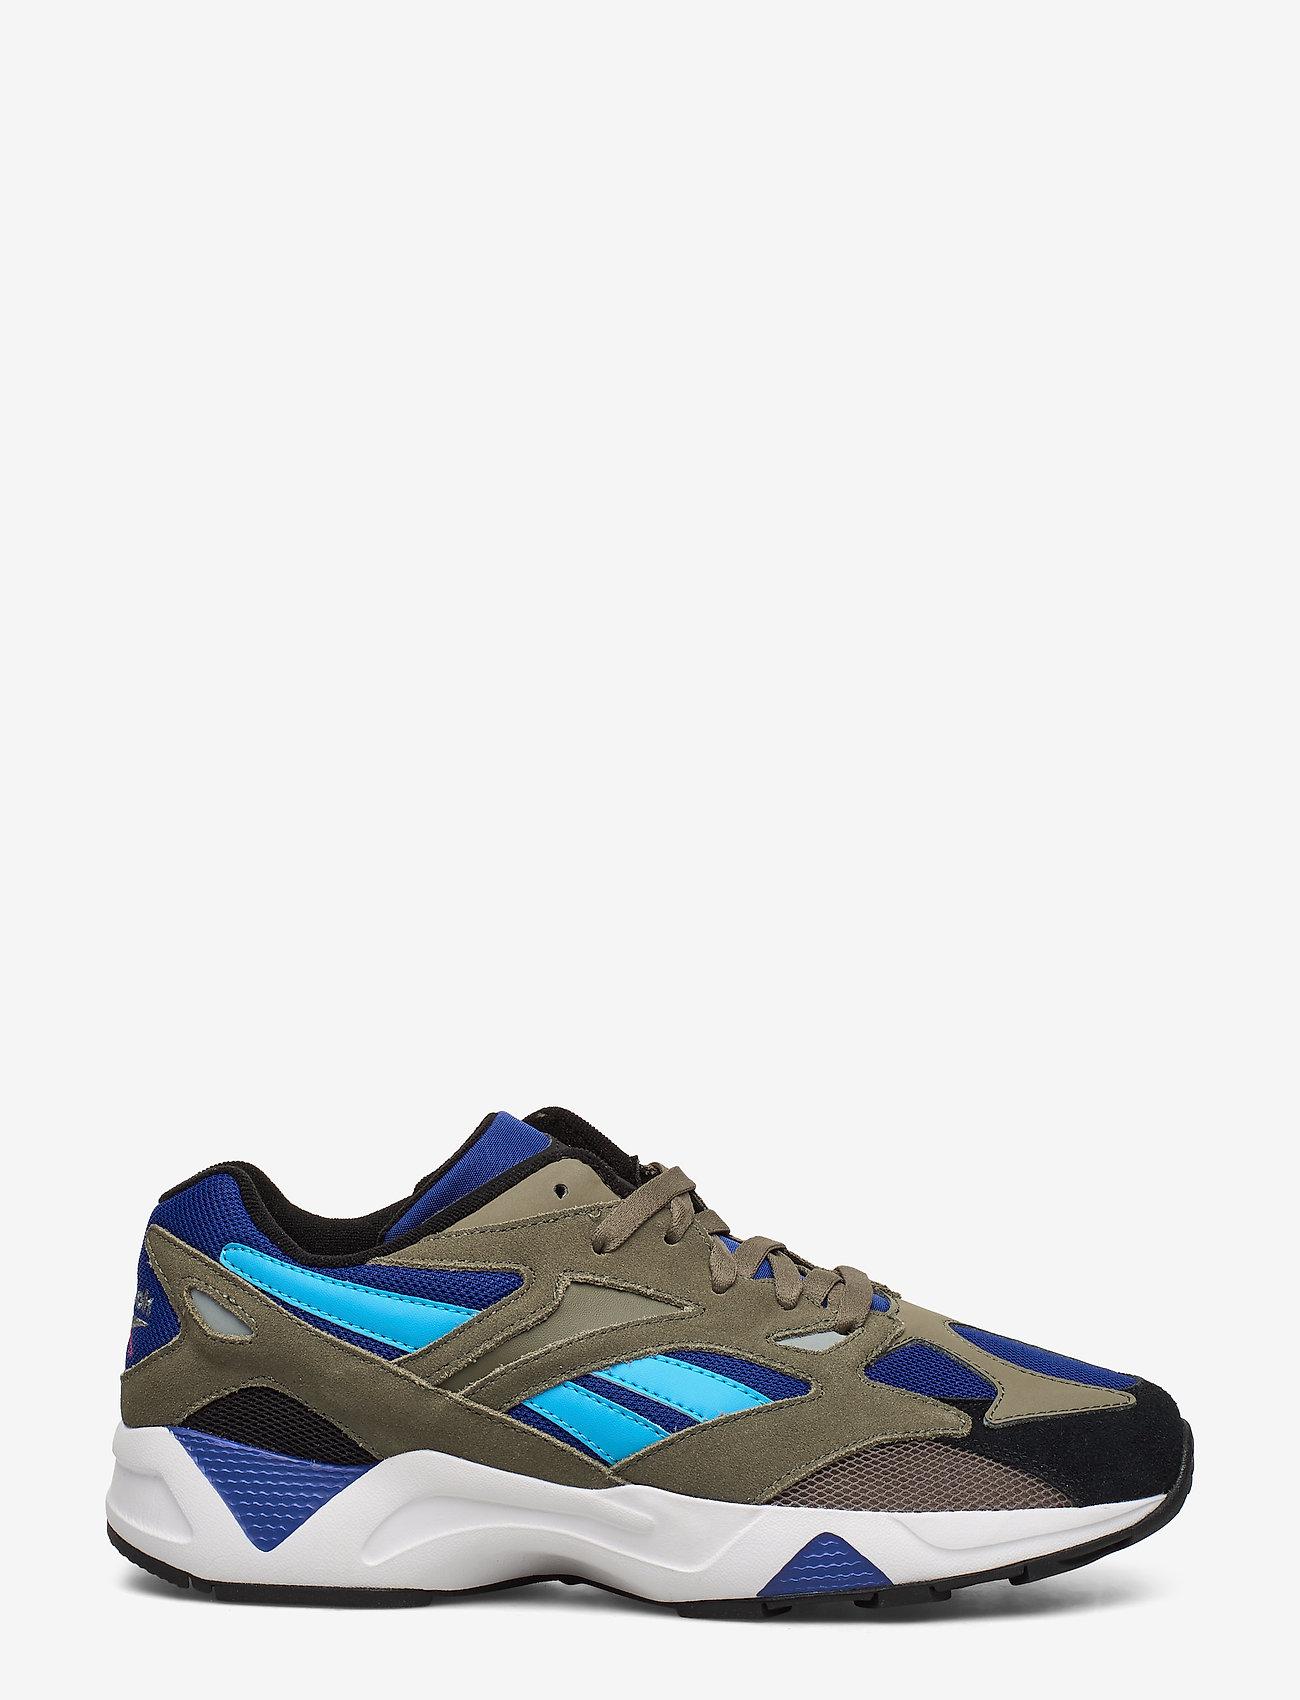 Reebok Classics Aztrek 96 - Sneakers